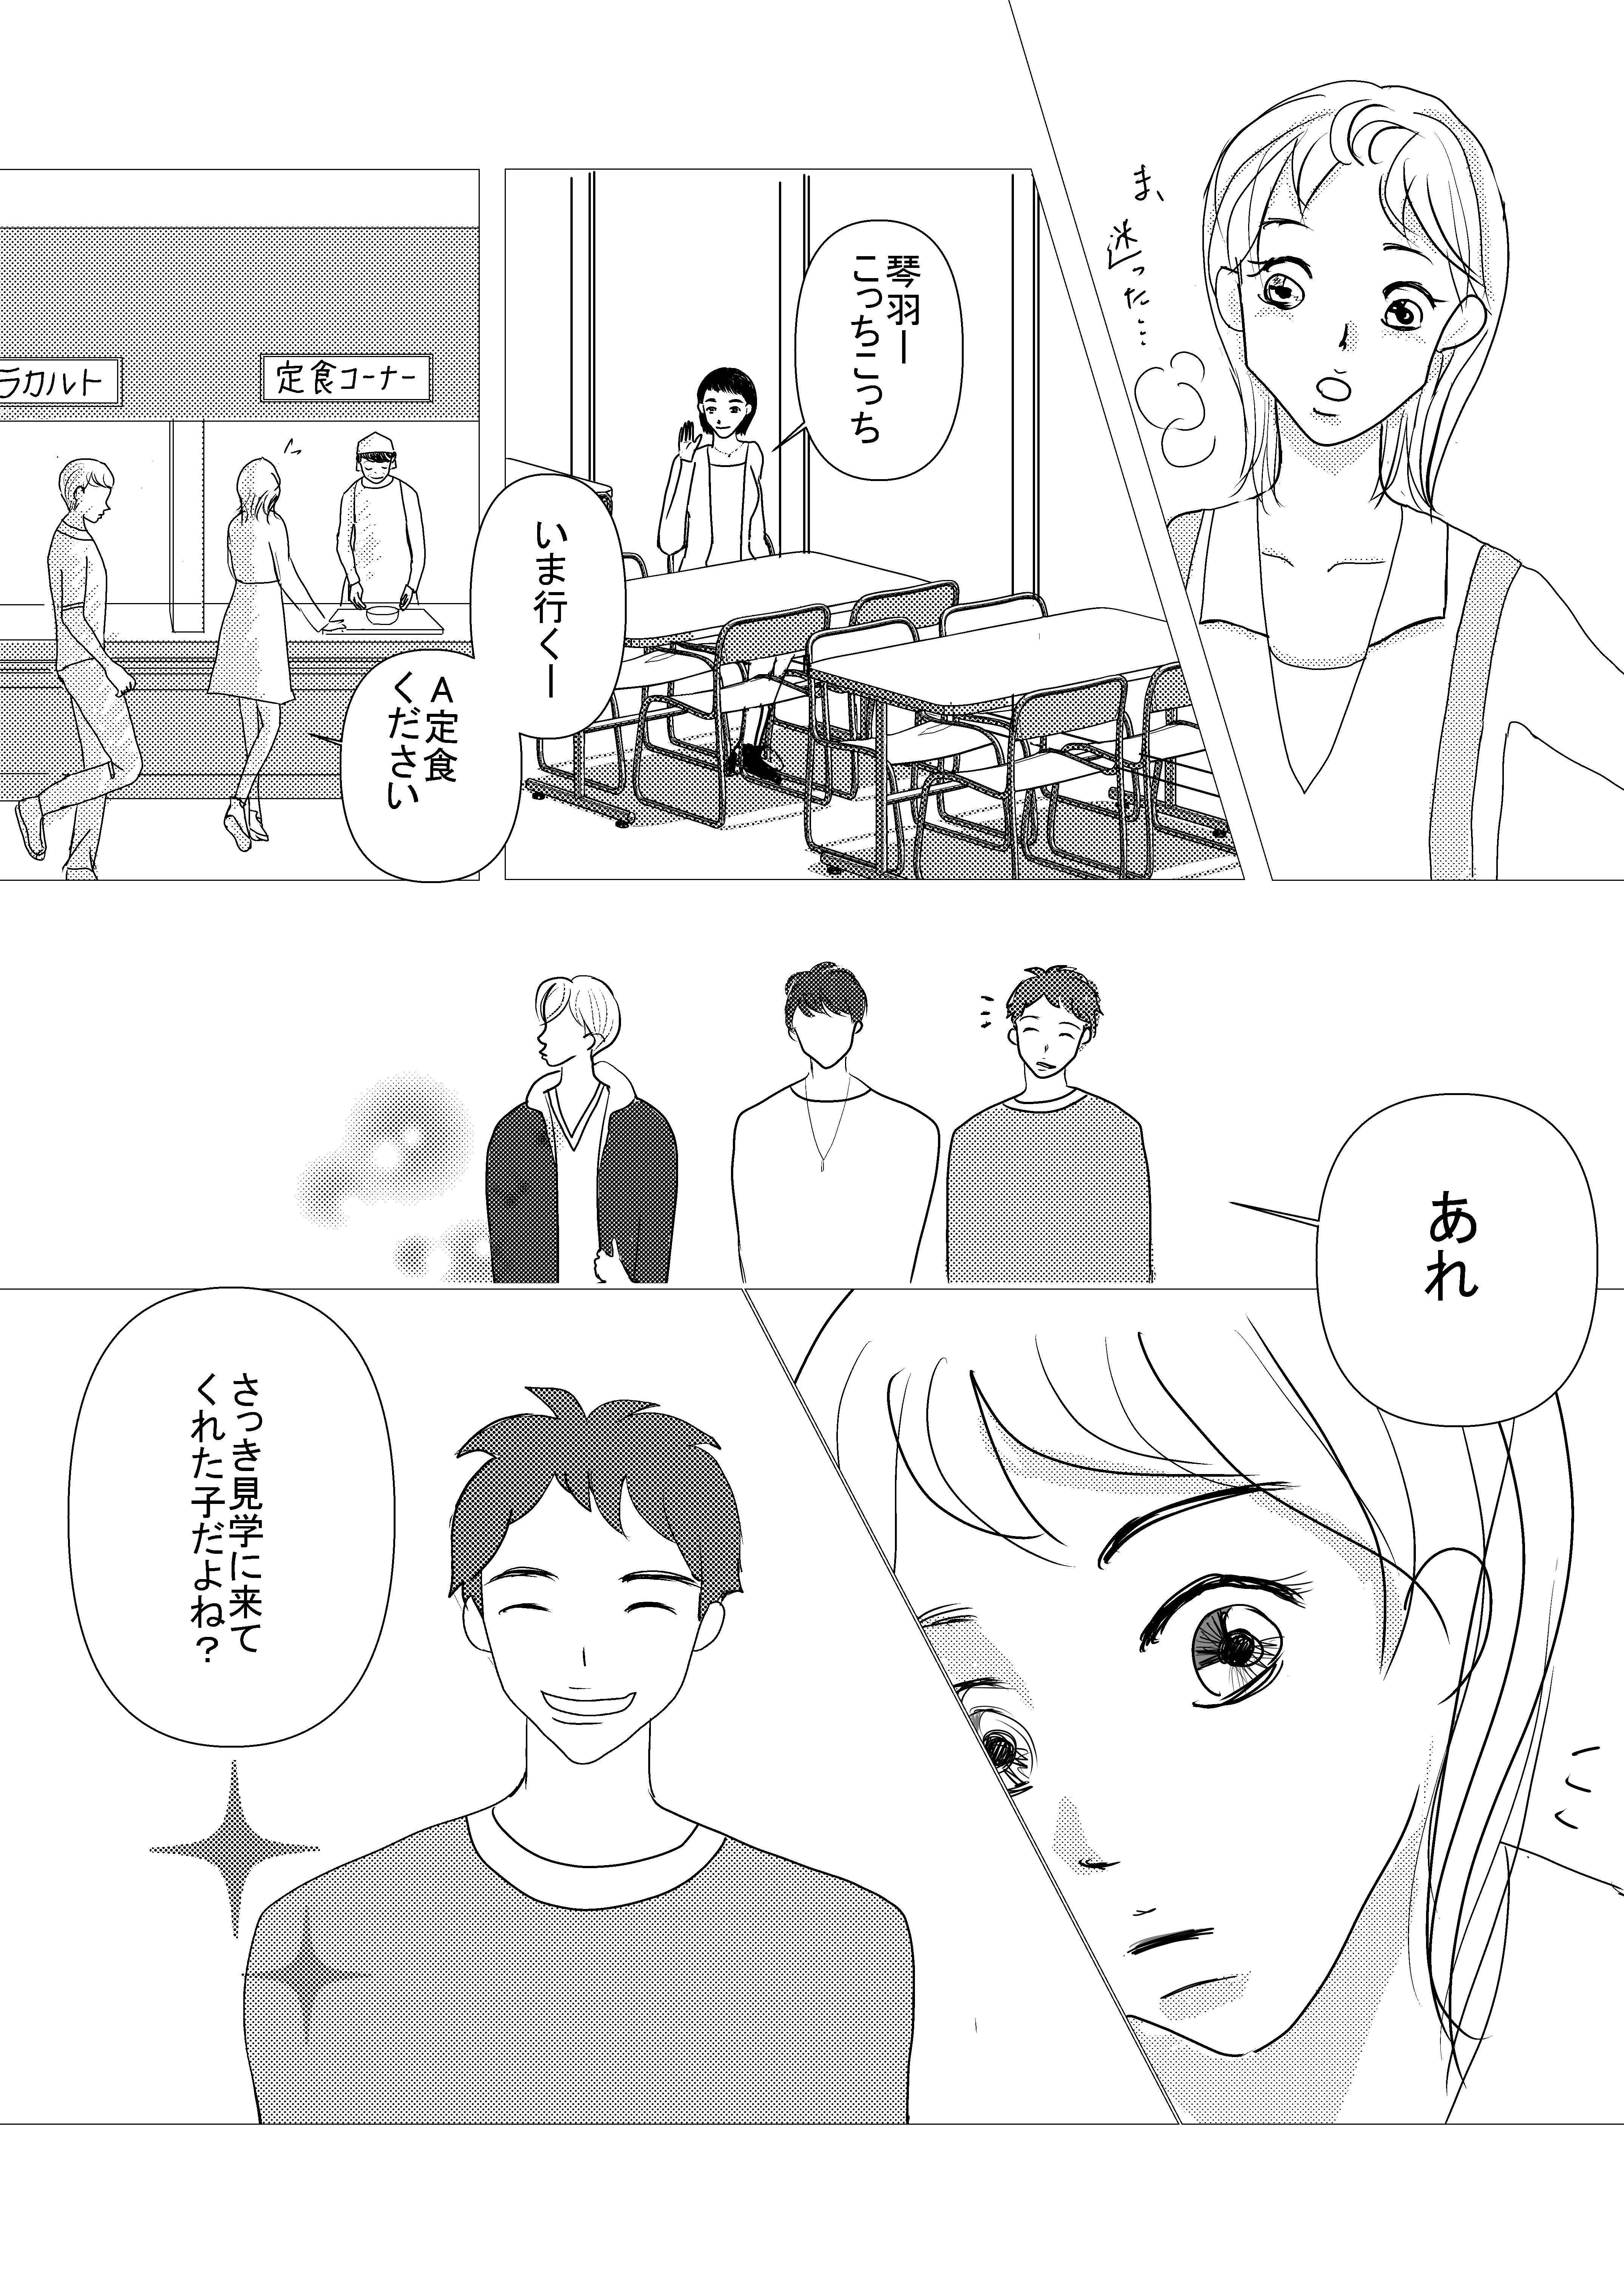 恋愛漫画/大学生/社会人/shoujyo manga/米加夢/6ページ